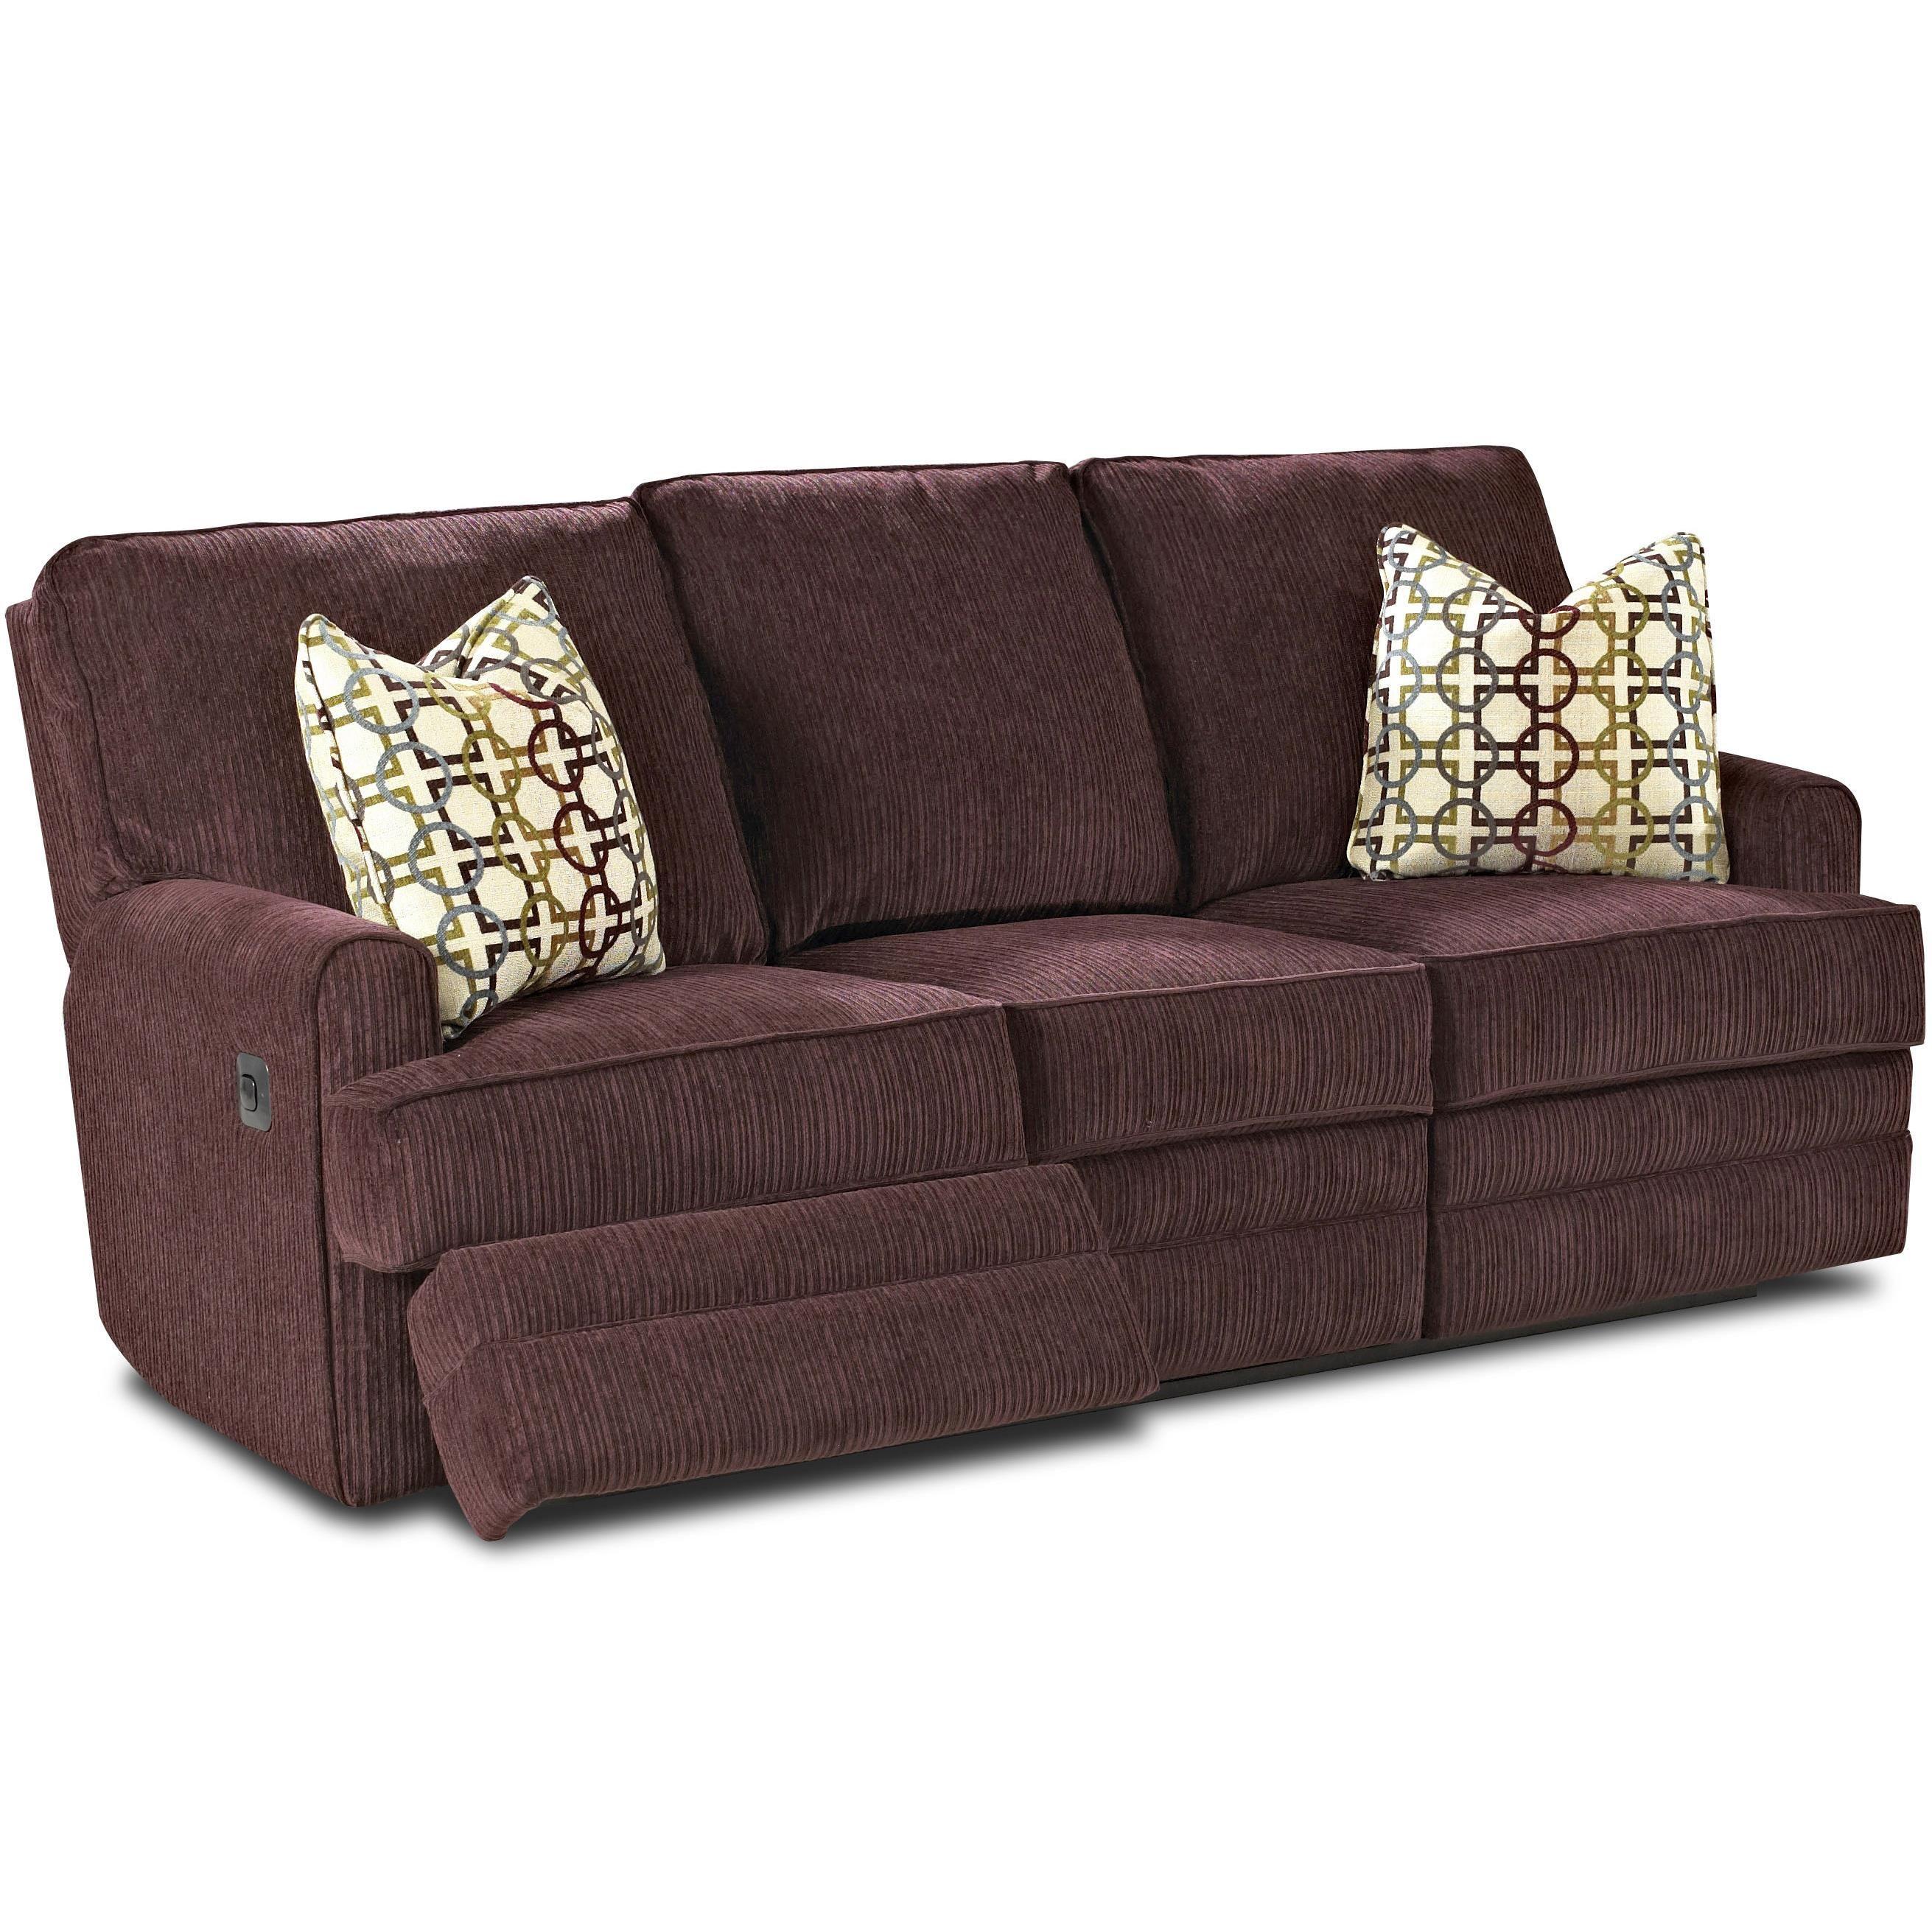 Casual Power Reclining Sofa Power reclining sofa